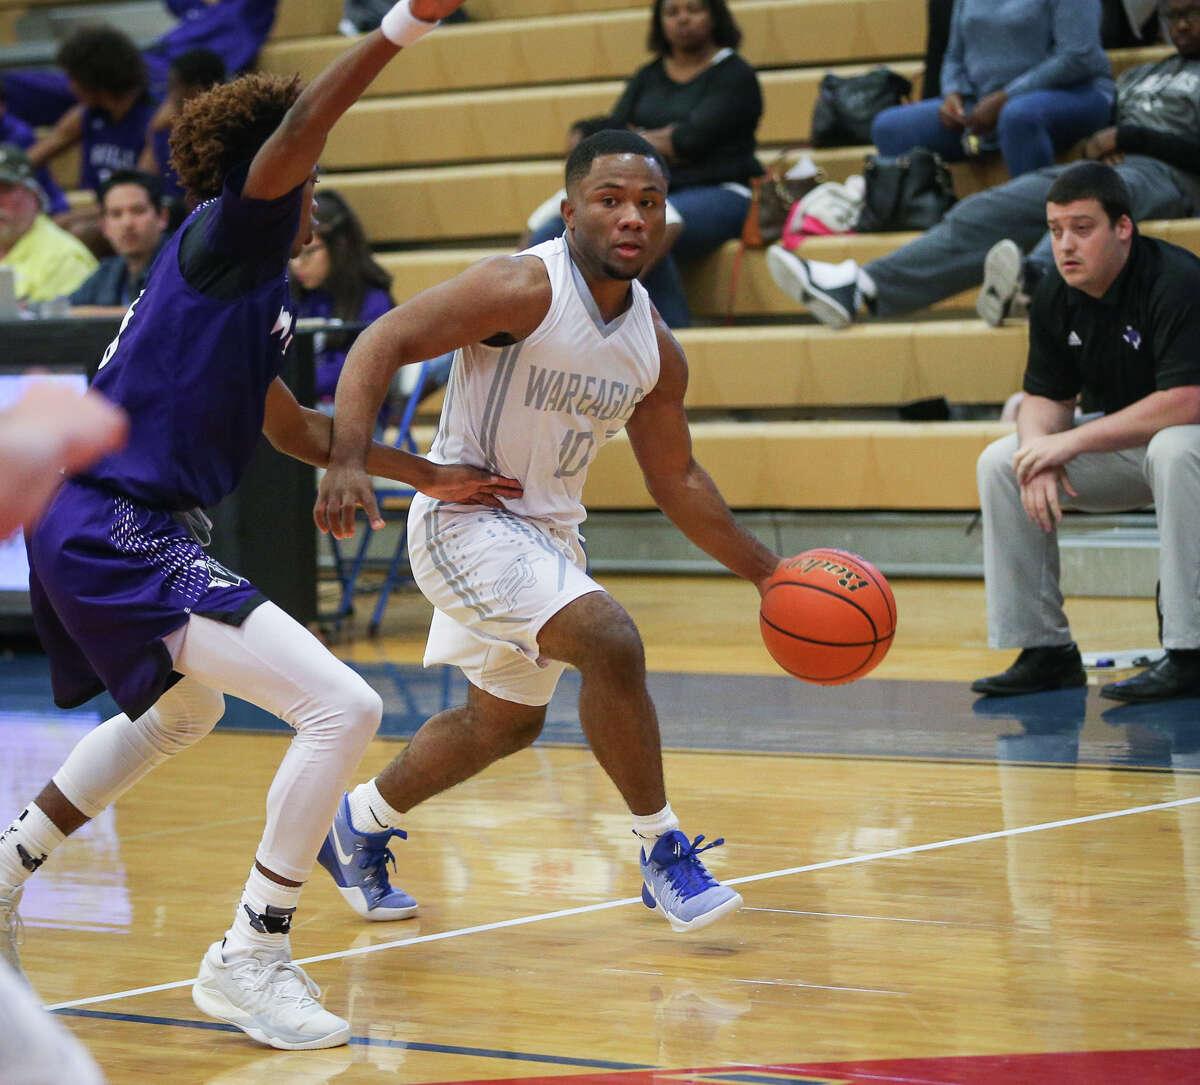 Oak Ridge's De'Aveon High (10) tries to get past Willis' Malik Hadnot (3) during the varsity boys basketball game on Tuesday, Nov. 22, 2016, at Oak Ridge High School. (Michael Minasi / Chronicle)